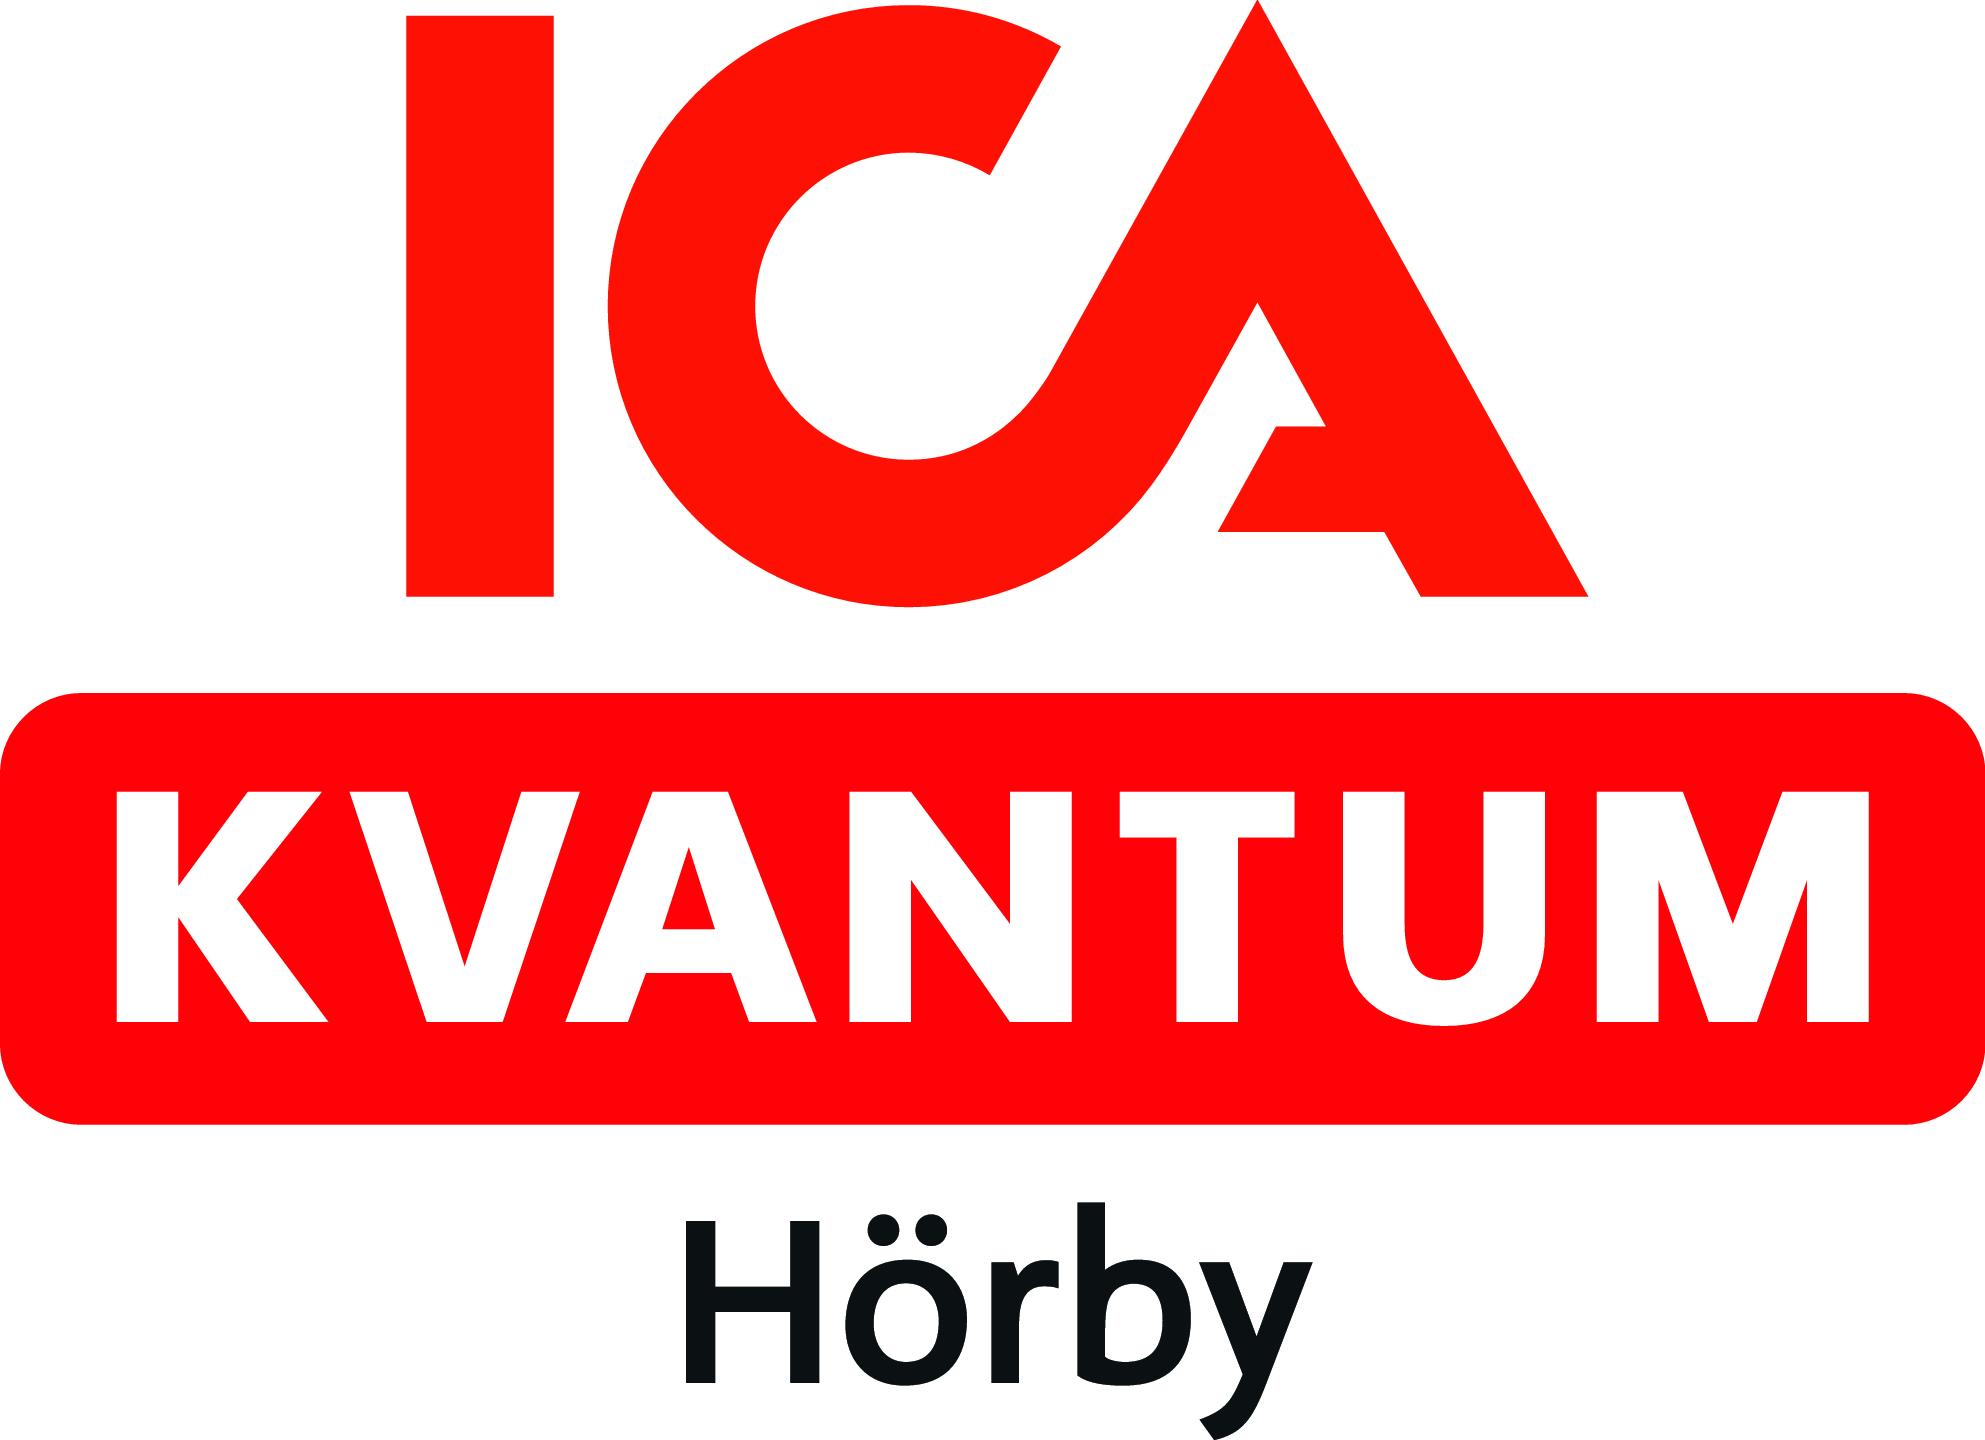 ICA kvantum Hörby logotyp